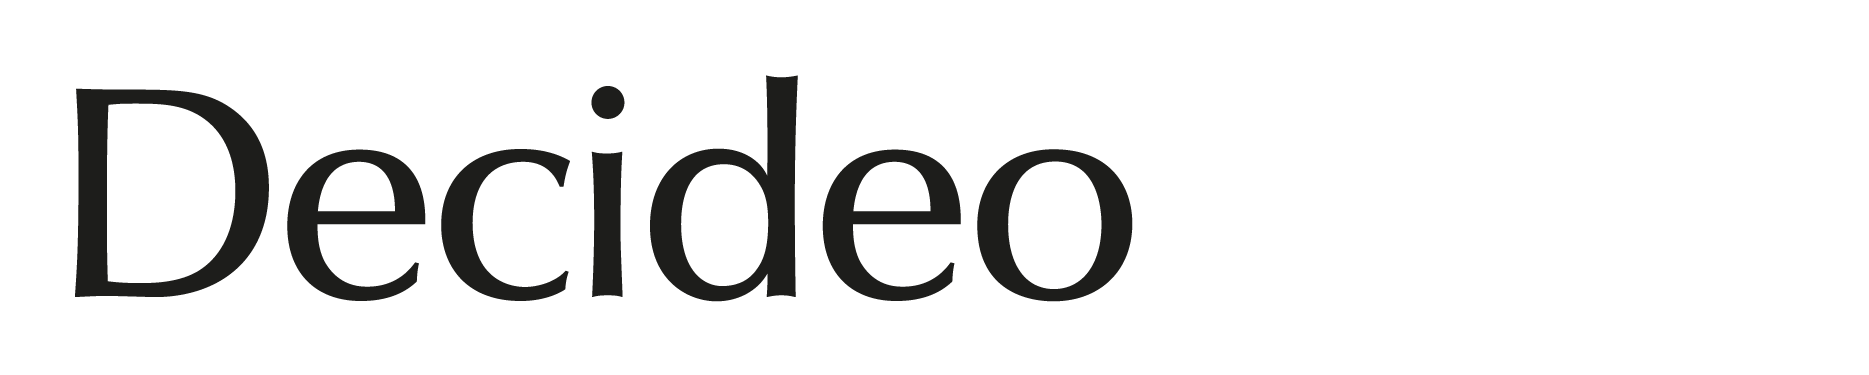 DECIDEO-logos-CMJN